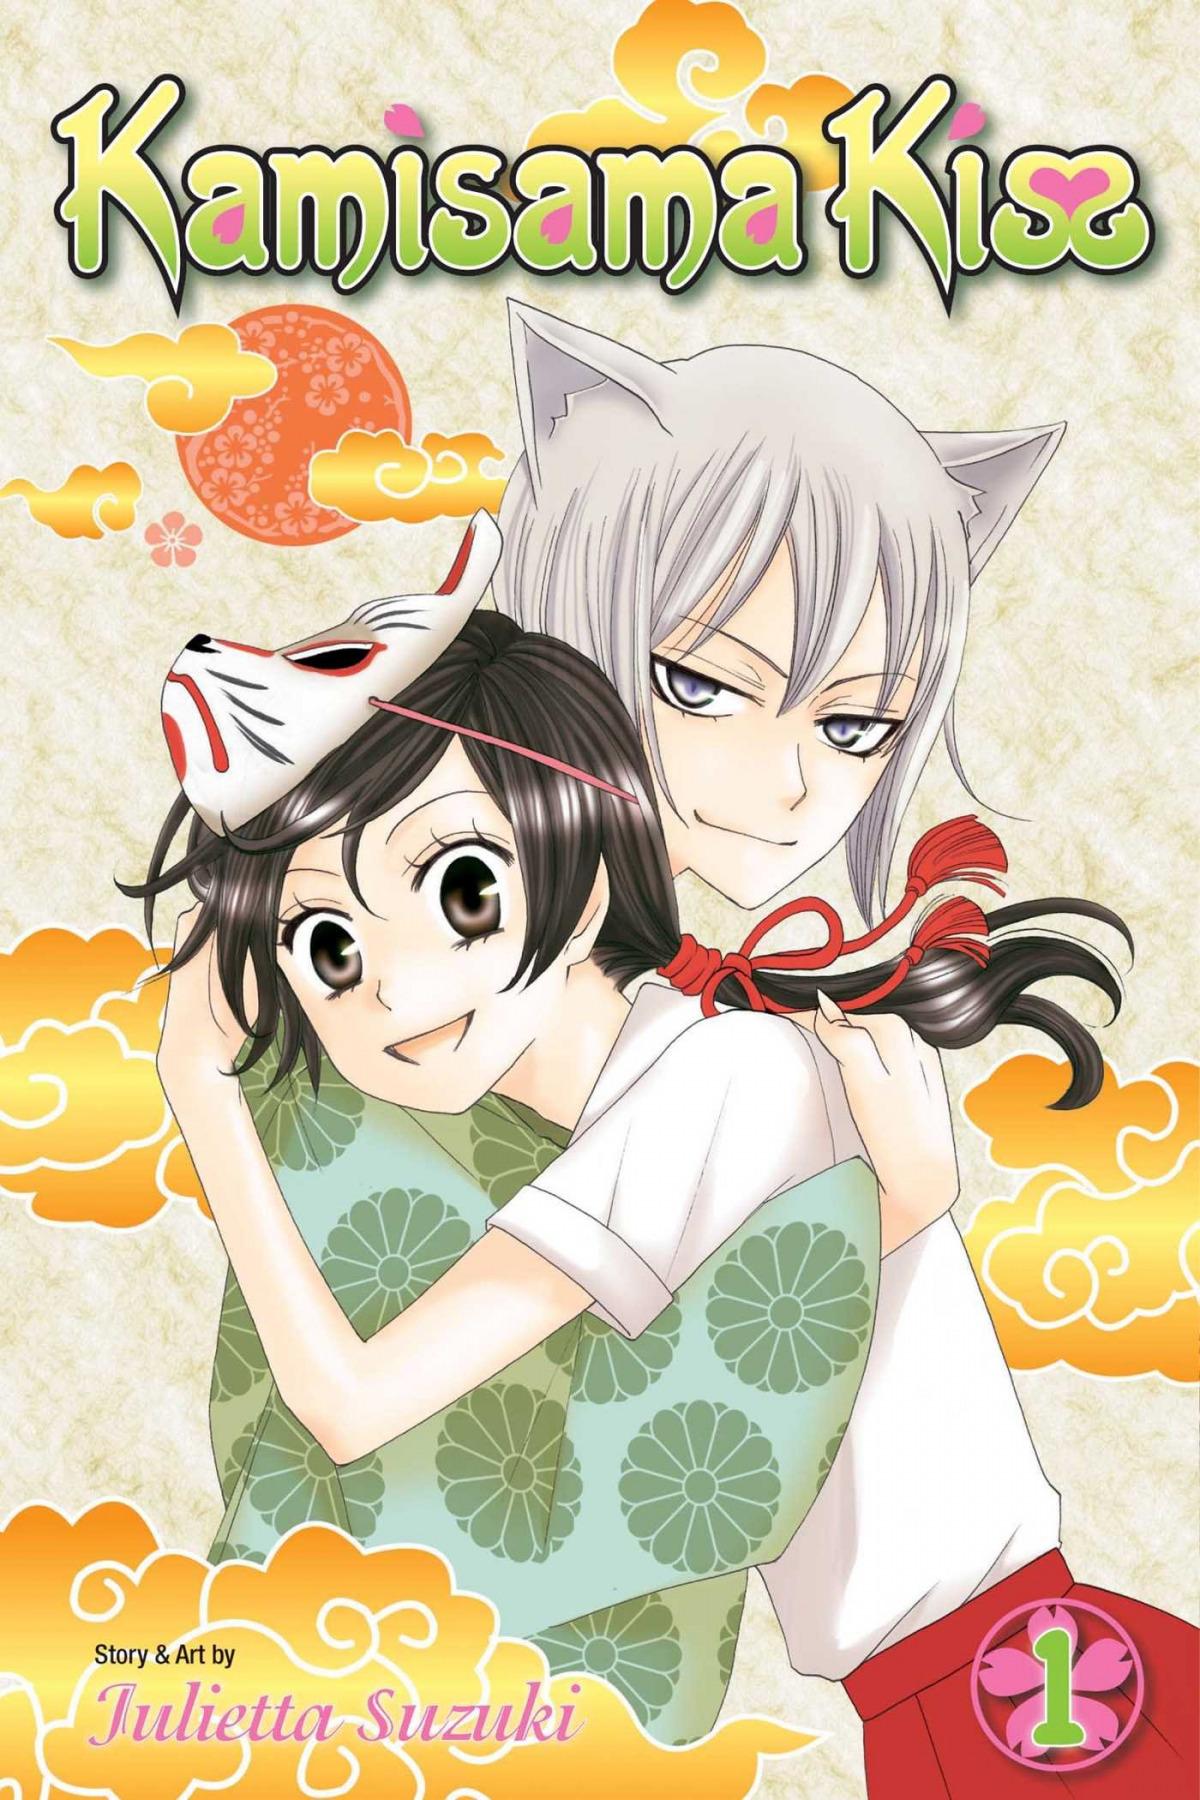 (suzuki). kamisama kiss 01 (simon and sch)